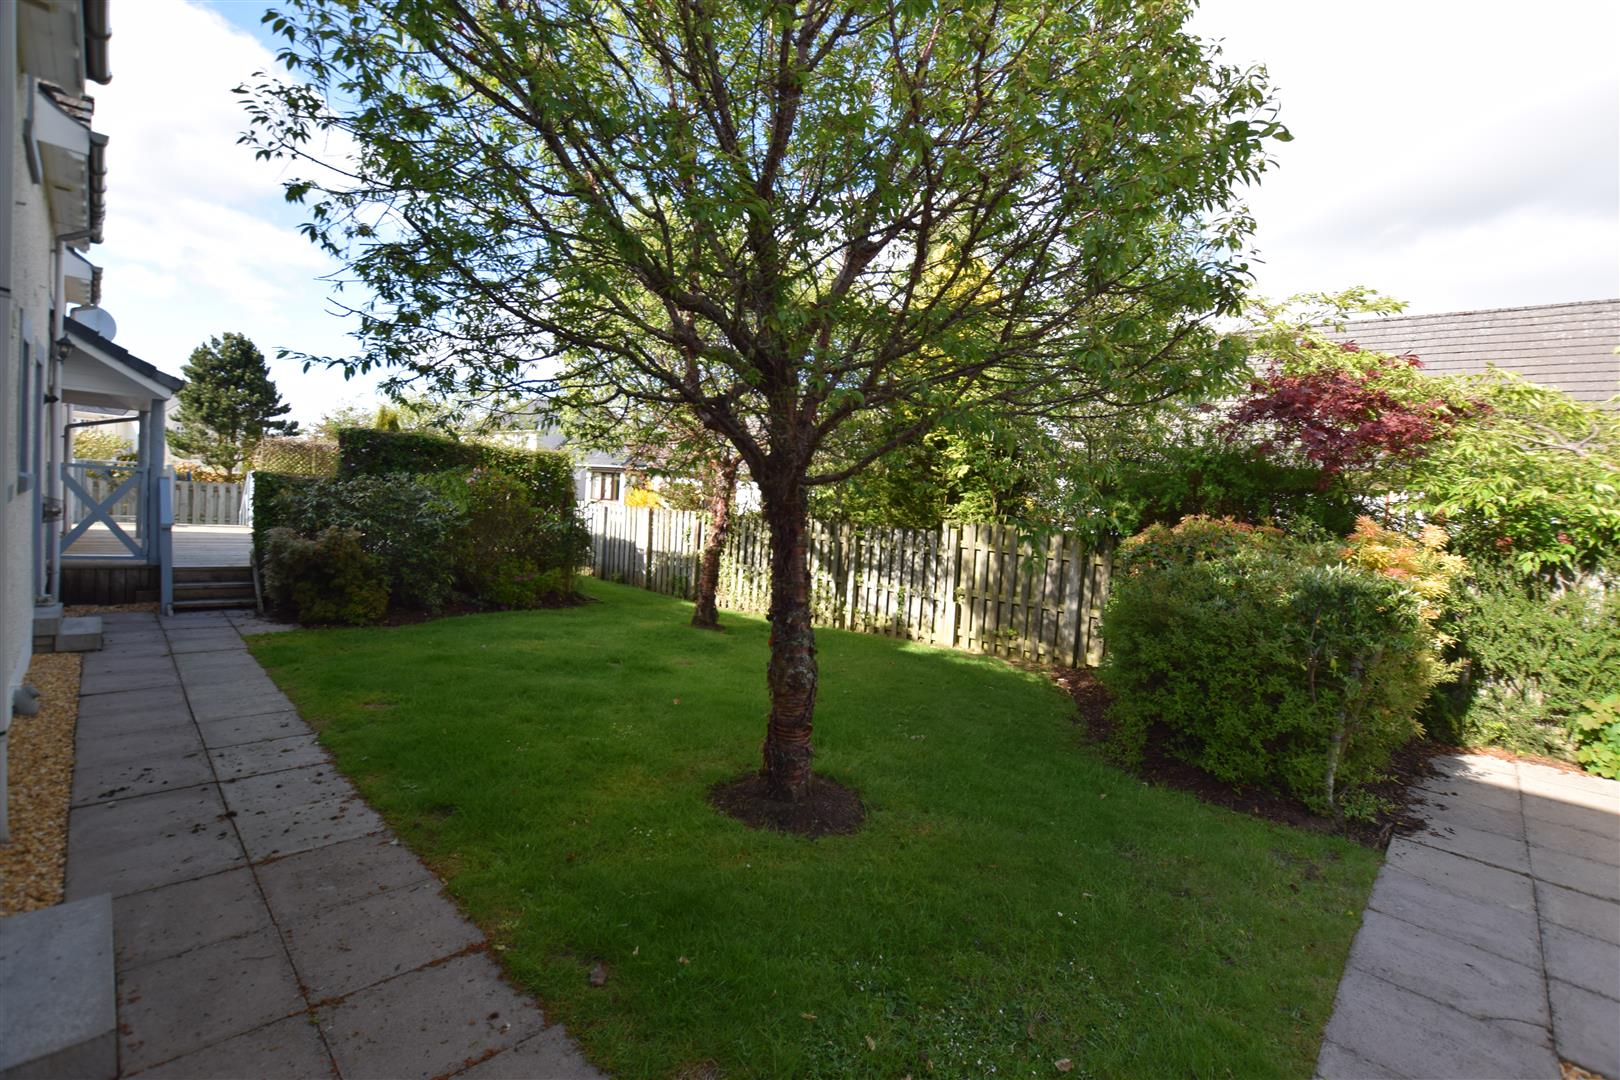 5, Clydesdale Court, Auchterarder, PH3 1RB, UK